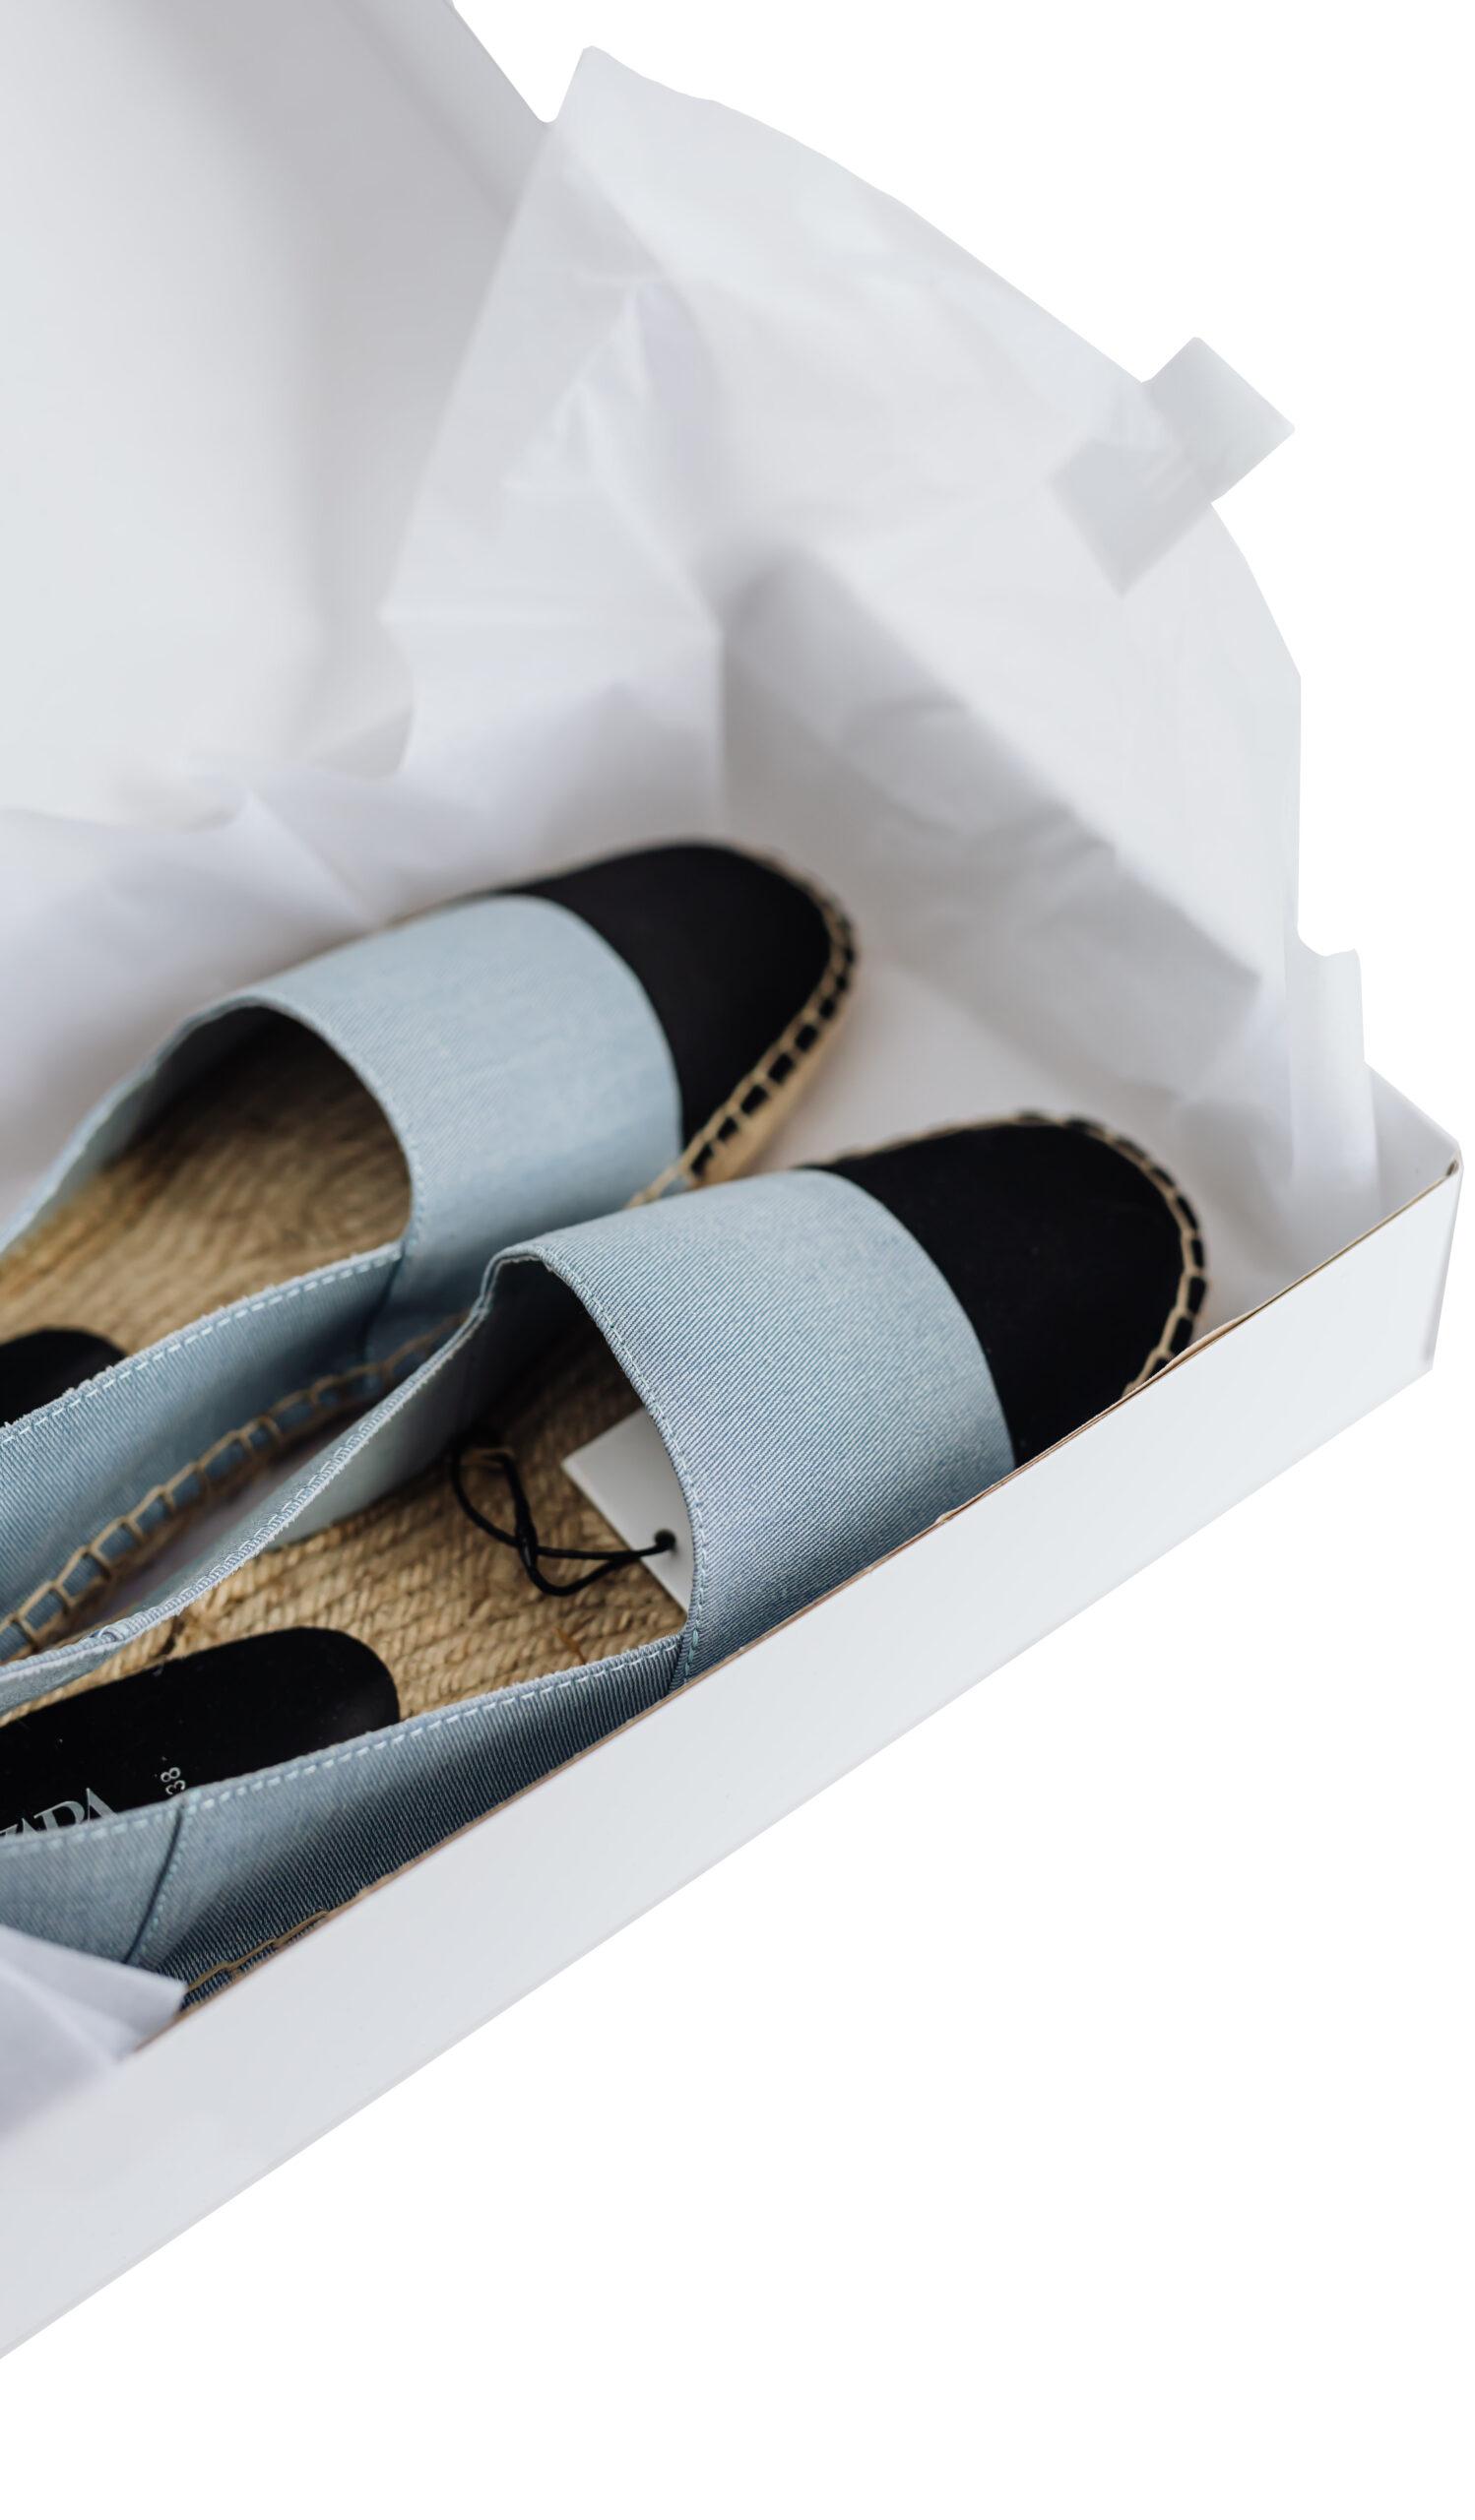 Canva Colorful stylish espadrilles pair in carton box